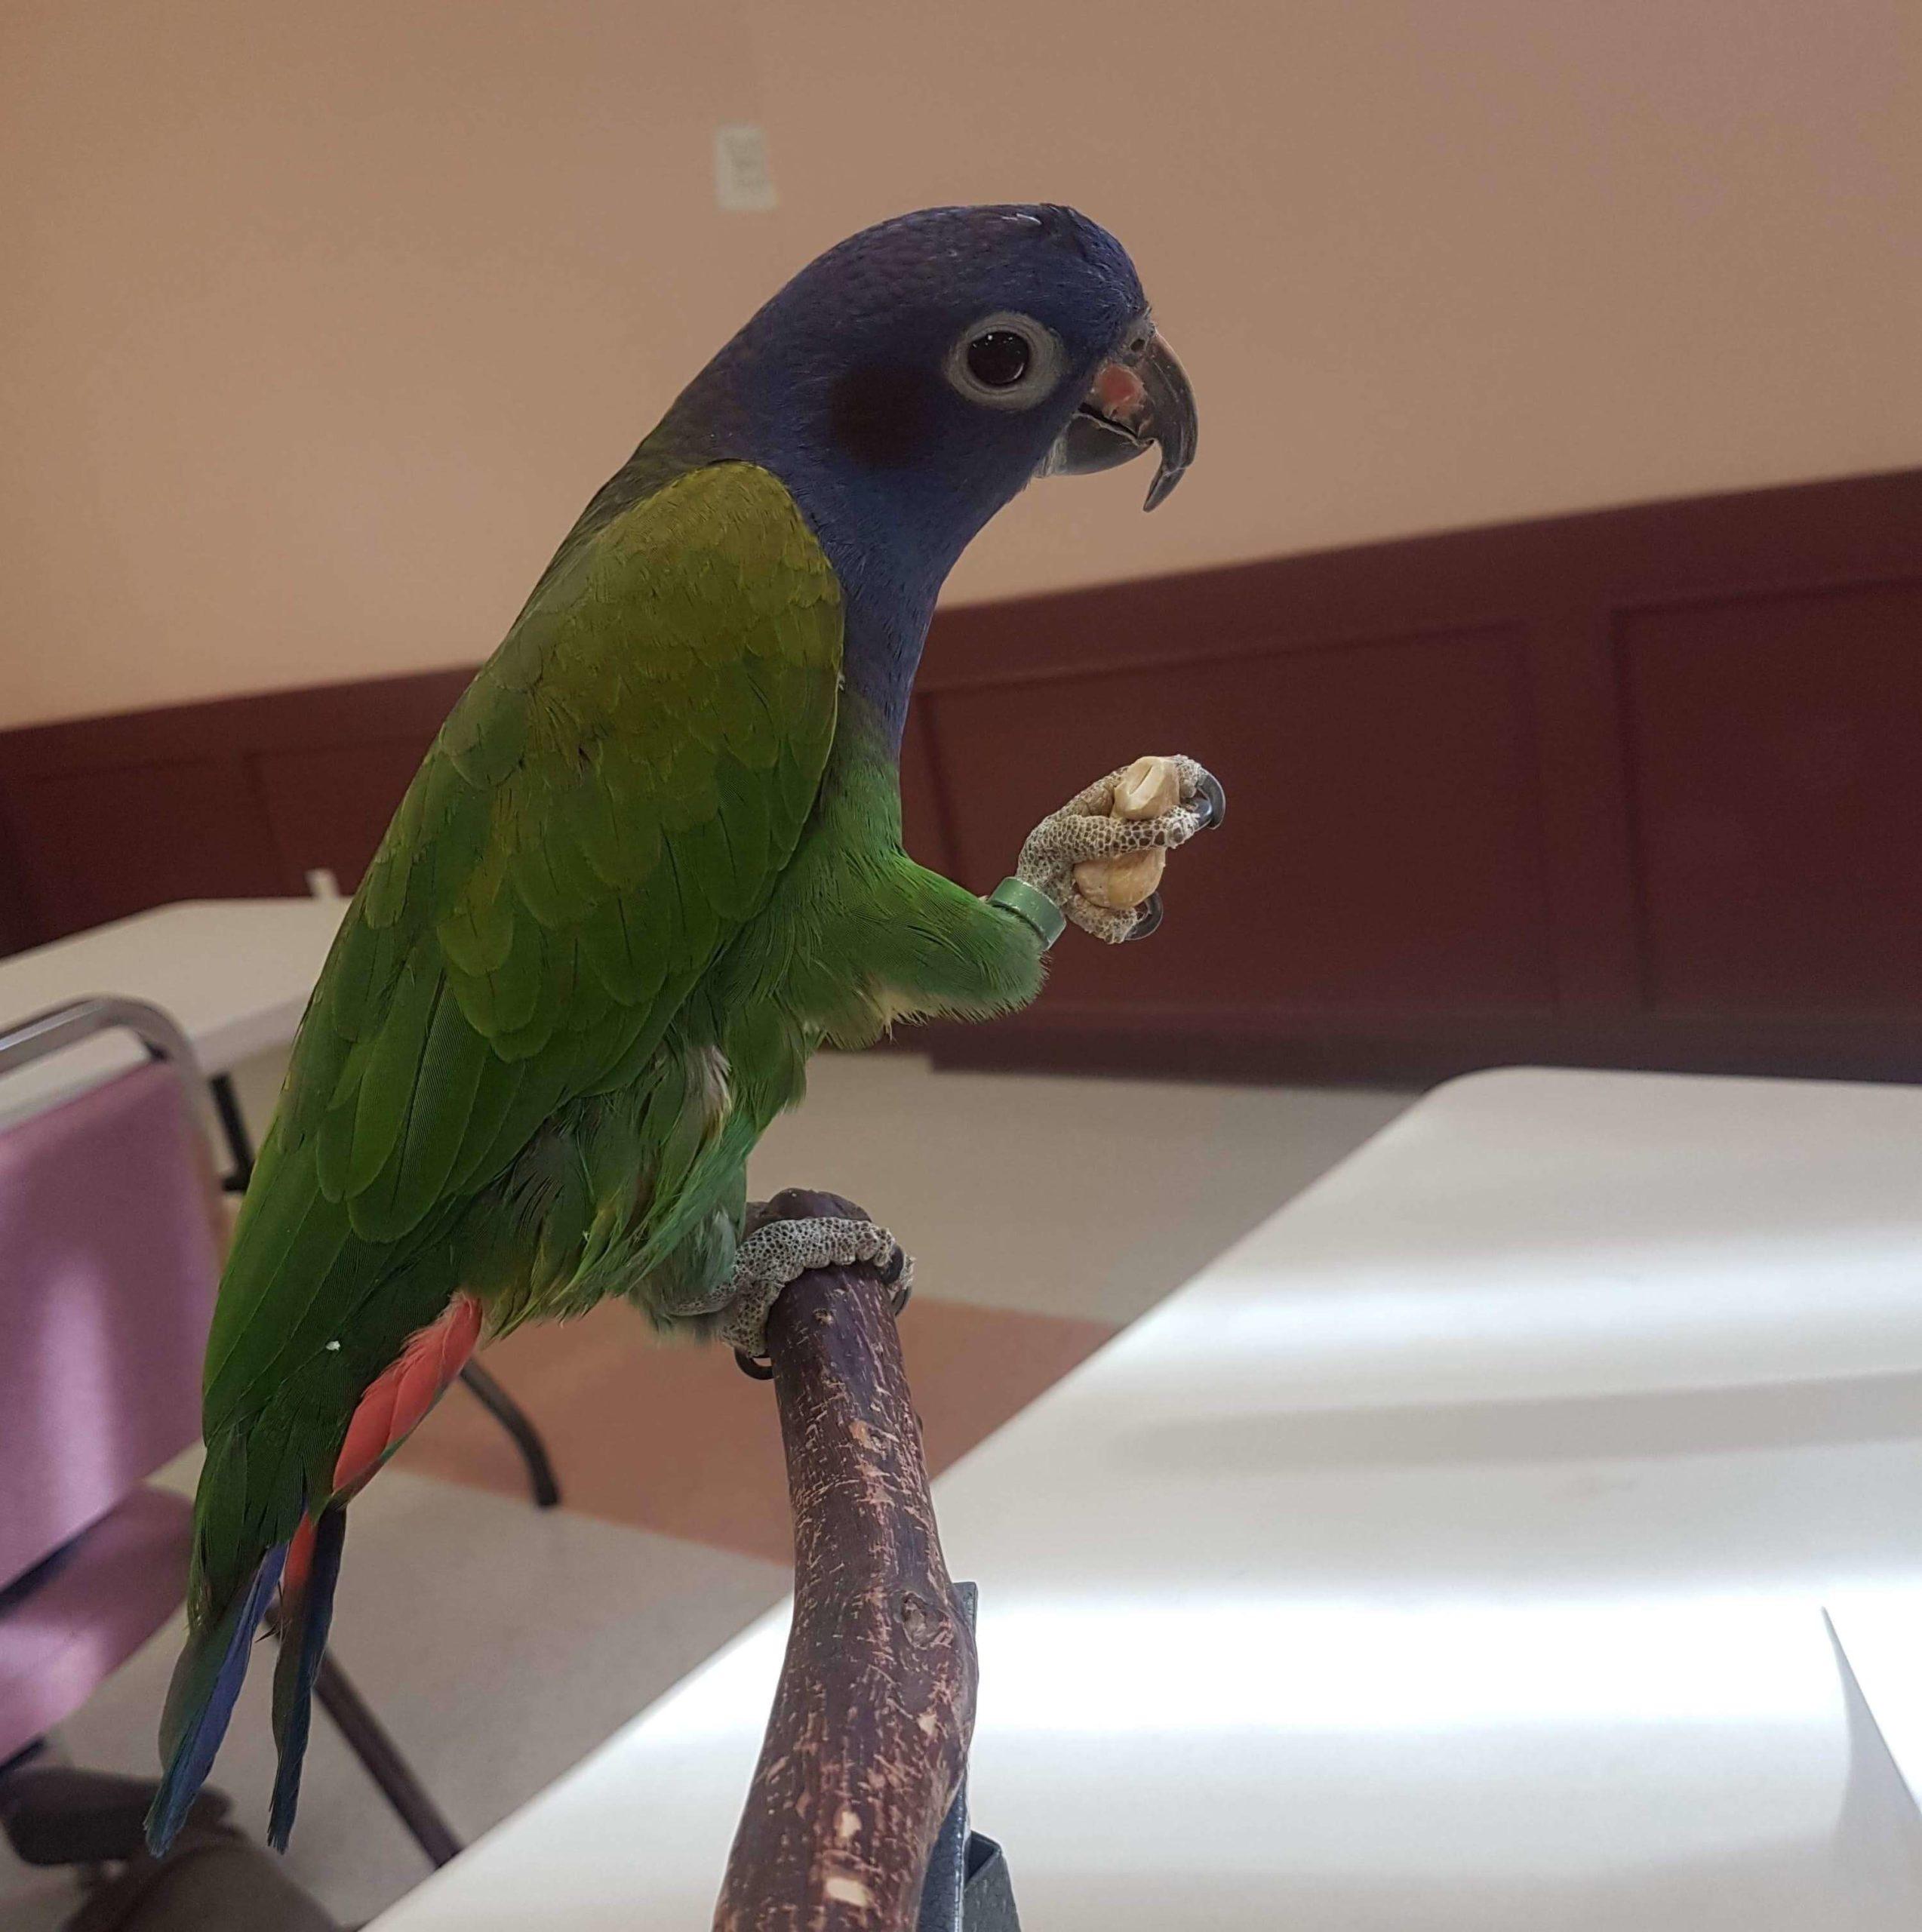 Bird Enjoying a treat